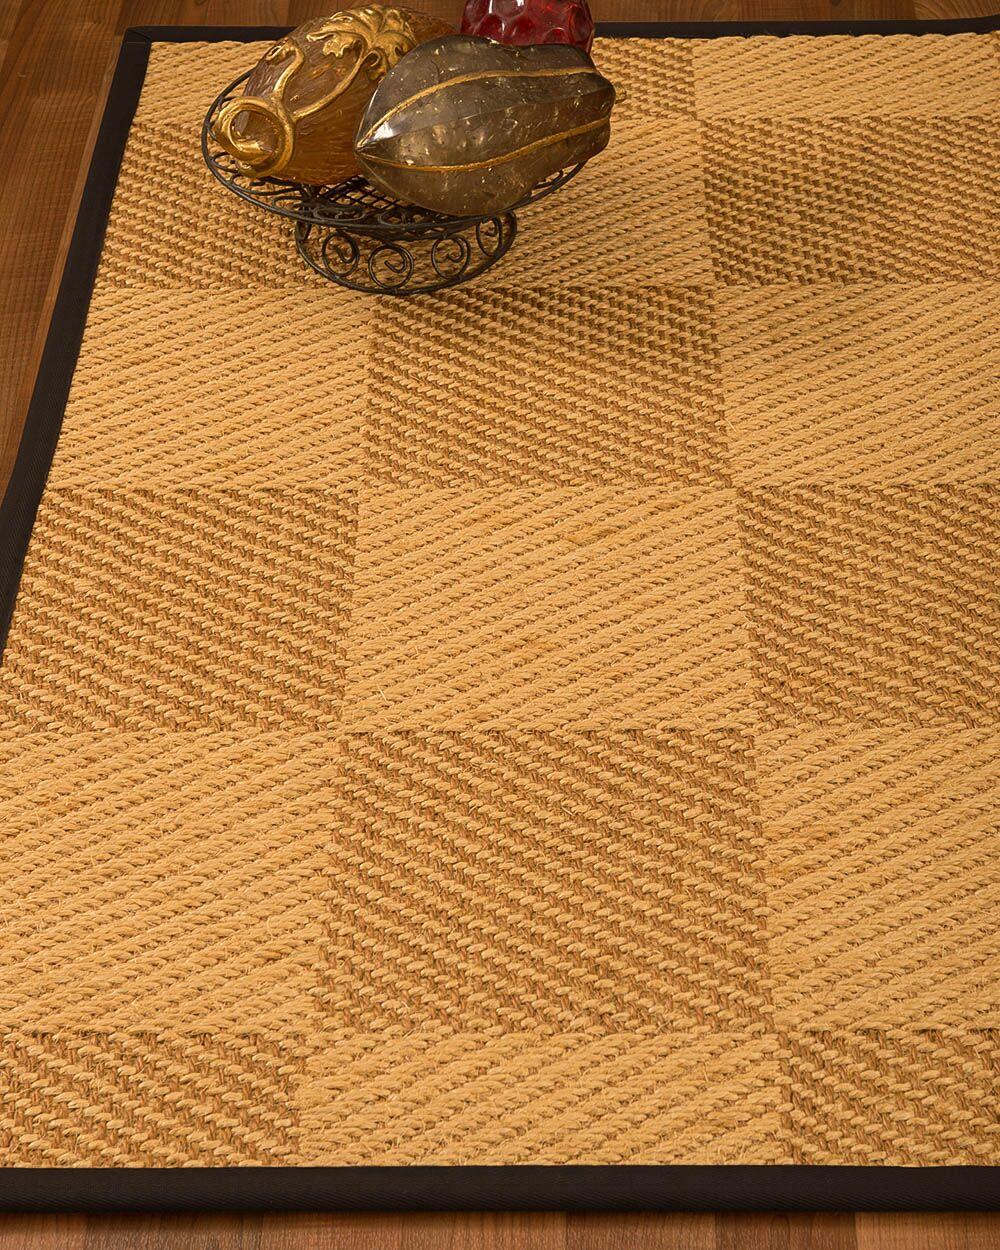 Luhrmann Hand Woven Jute/Sisal Beige/Brown Area Rug Rug Size: Rectangle 4' X 6'